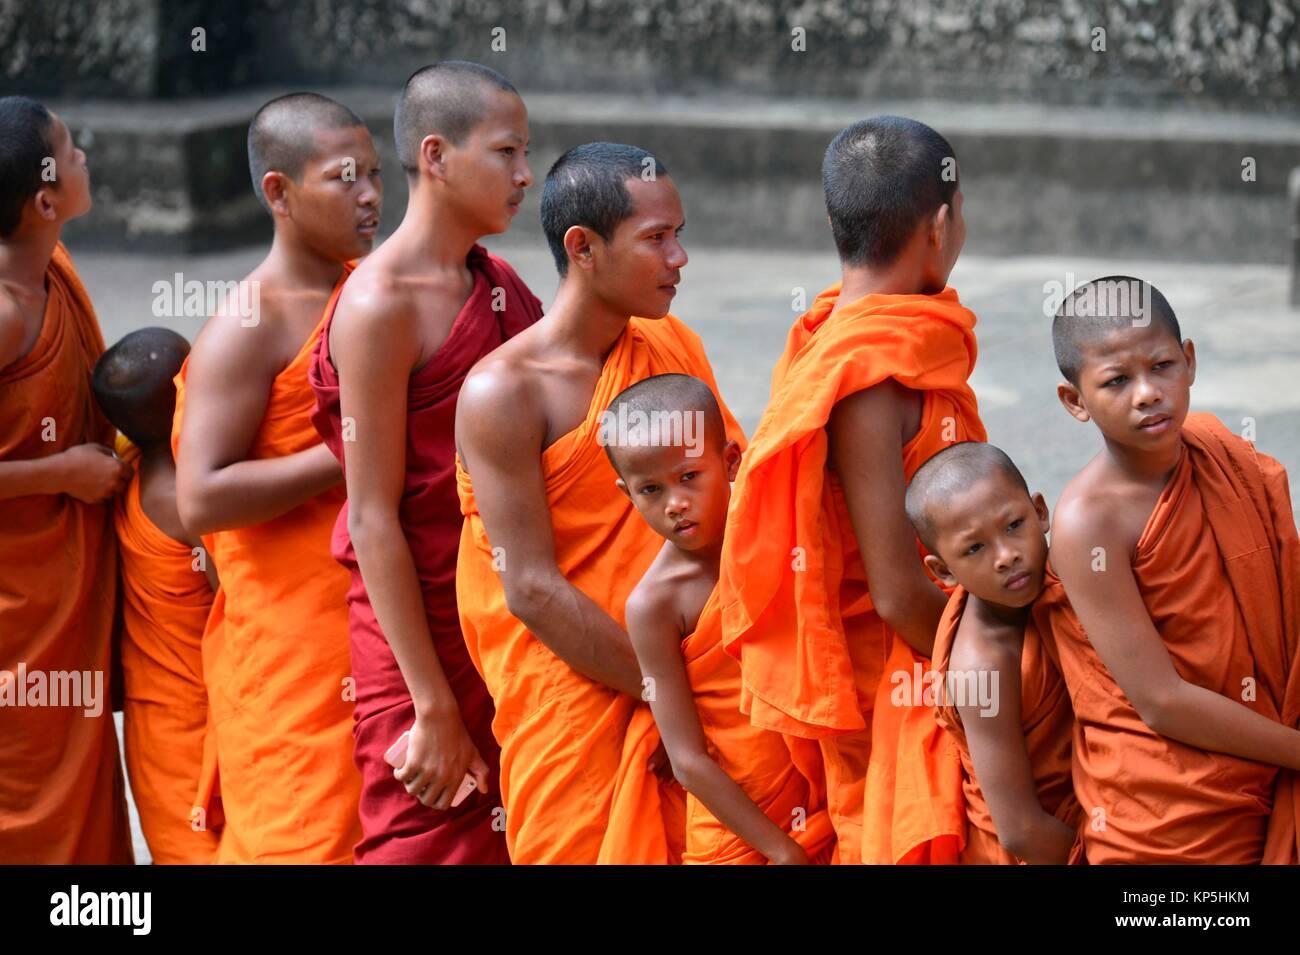 Buddhist monks,Angkor Wat, Cambodia,Indochina,Southeast Asia,Asia. - Stock Image